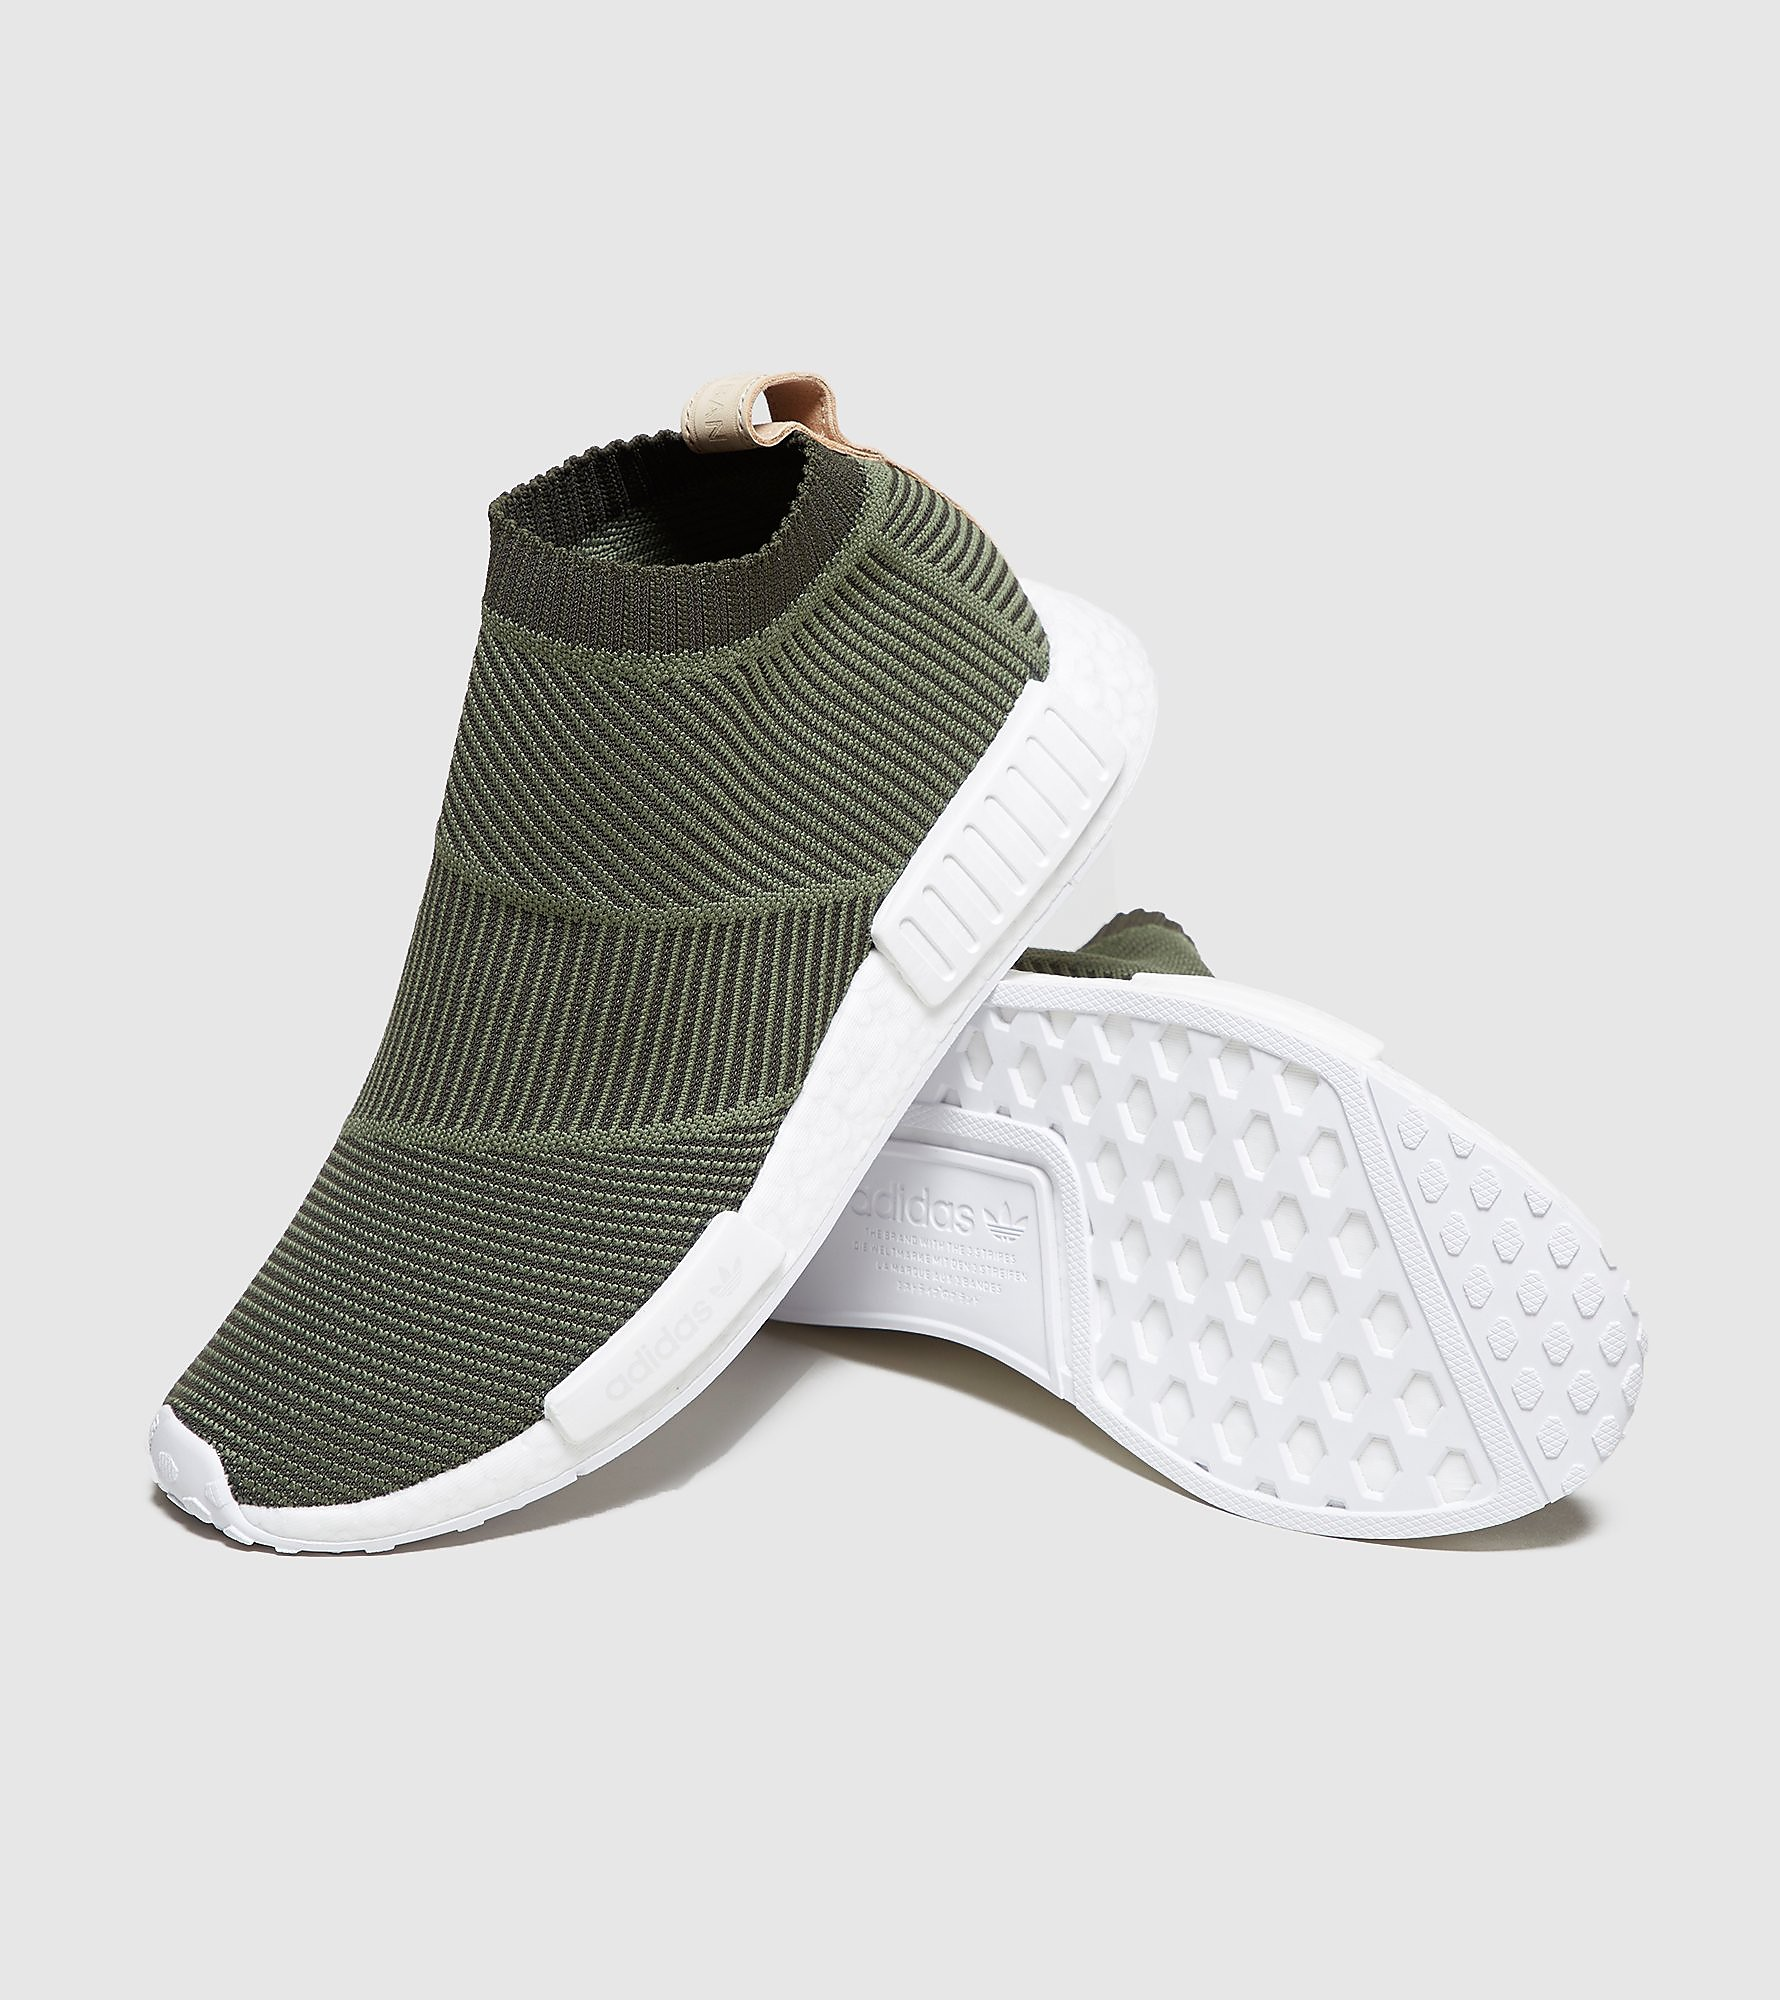 Adidas Originals Nmd Size